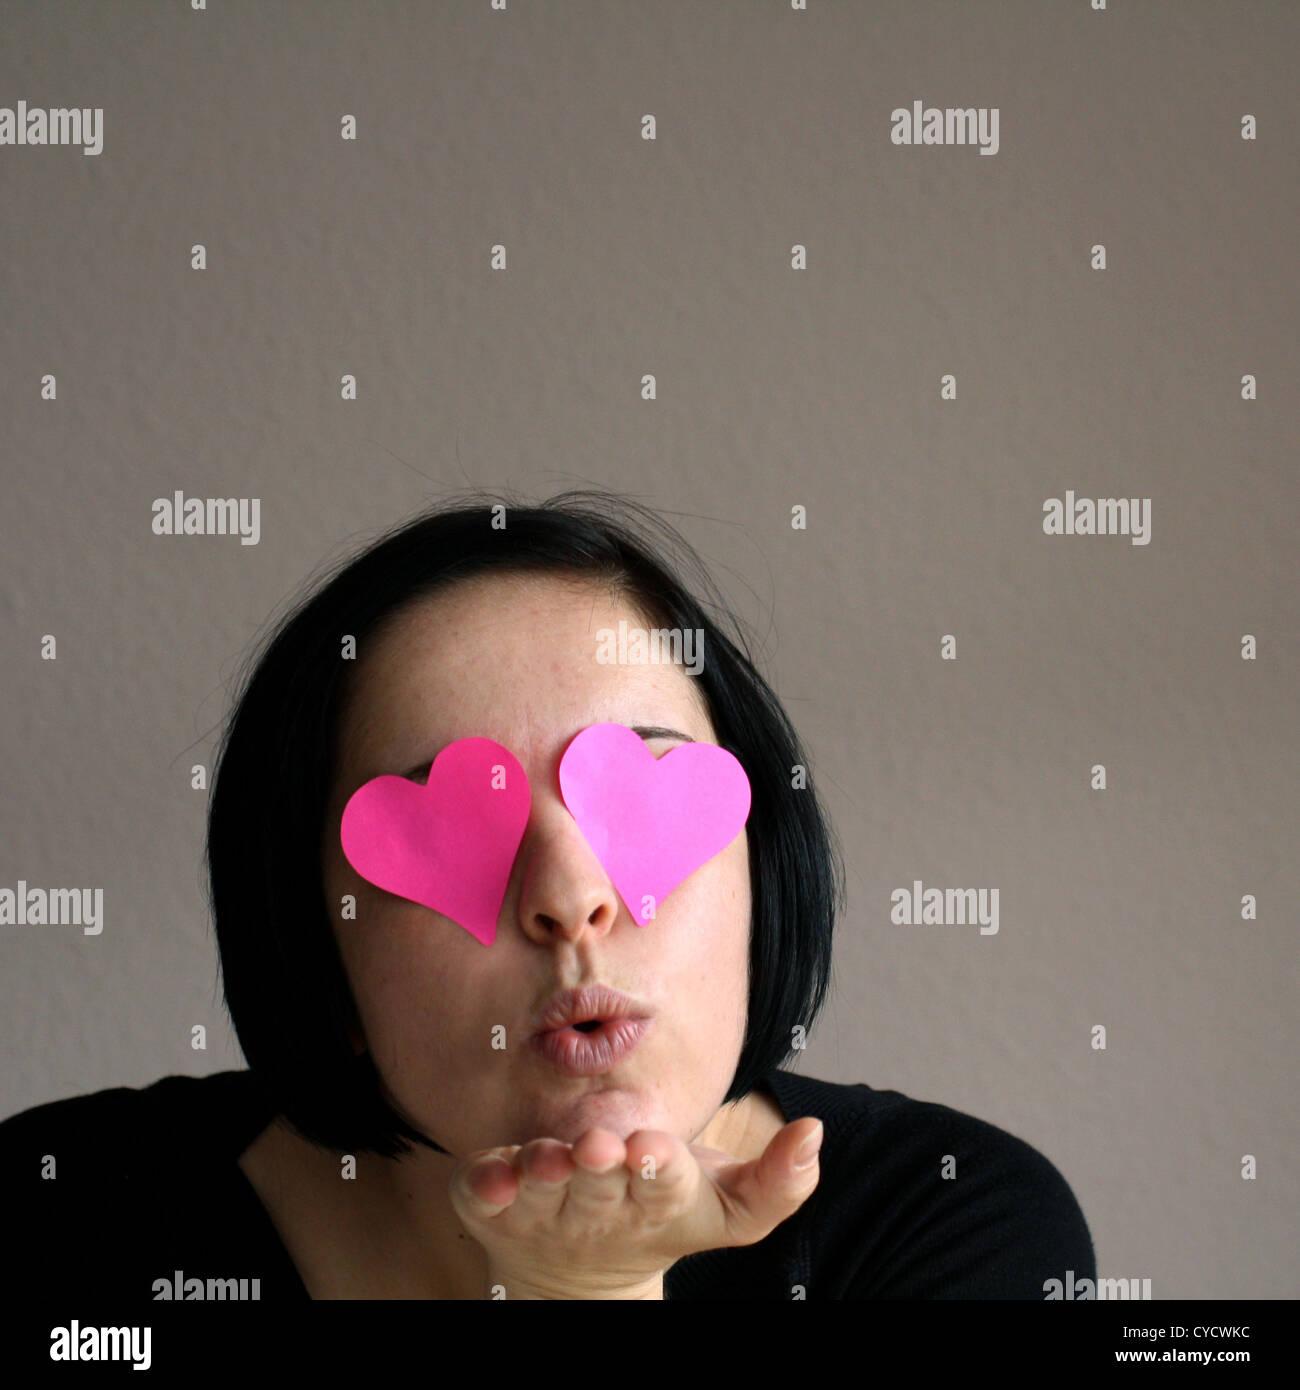 Aimer,lunettes roses,souffler un baiser Photo Stock